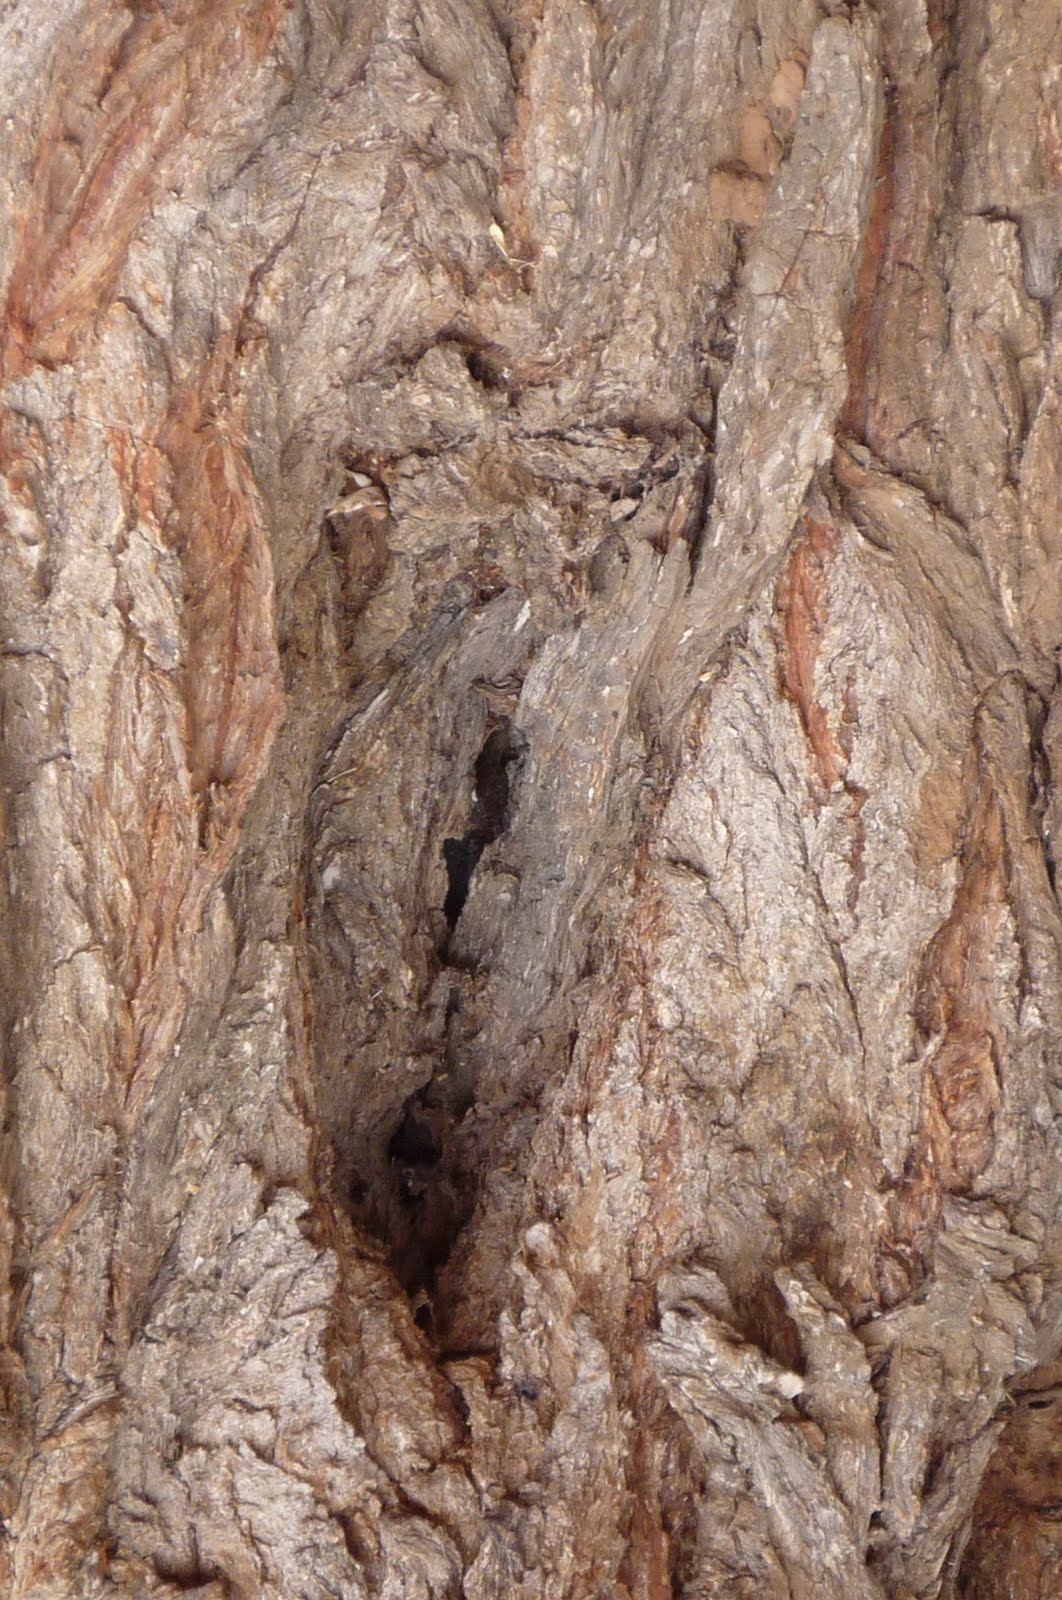 Fotos de panochas peludas